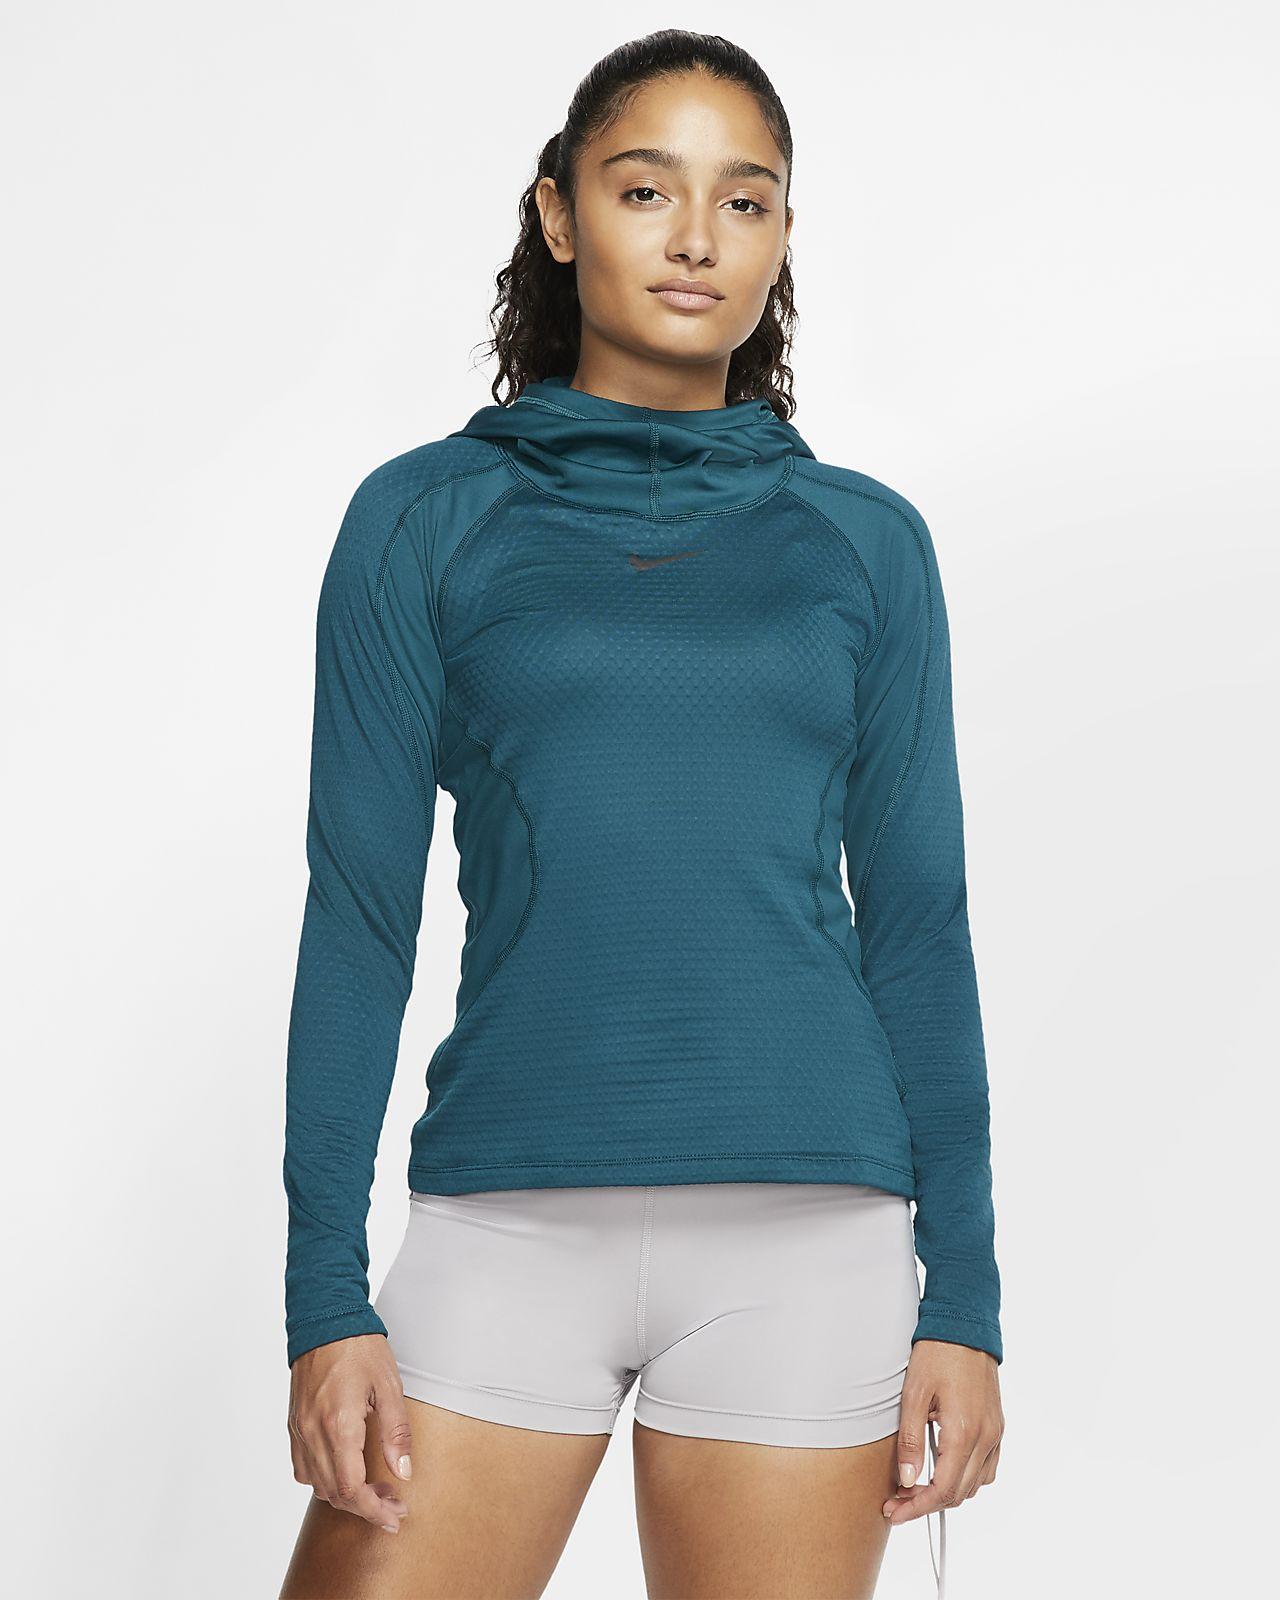 Damska bluza treningowa z kapturem Nike Pro HyperWarm